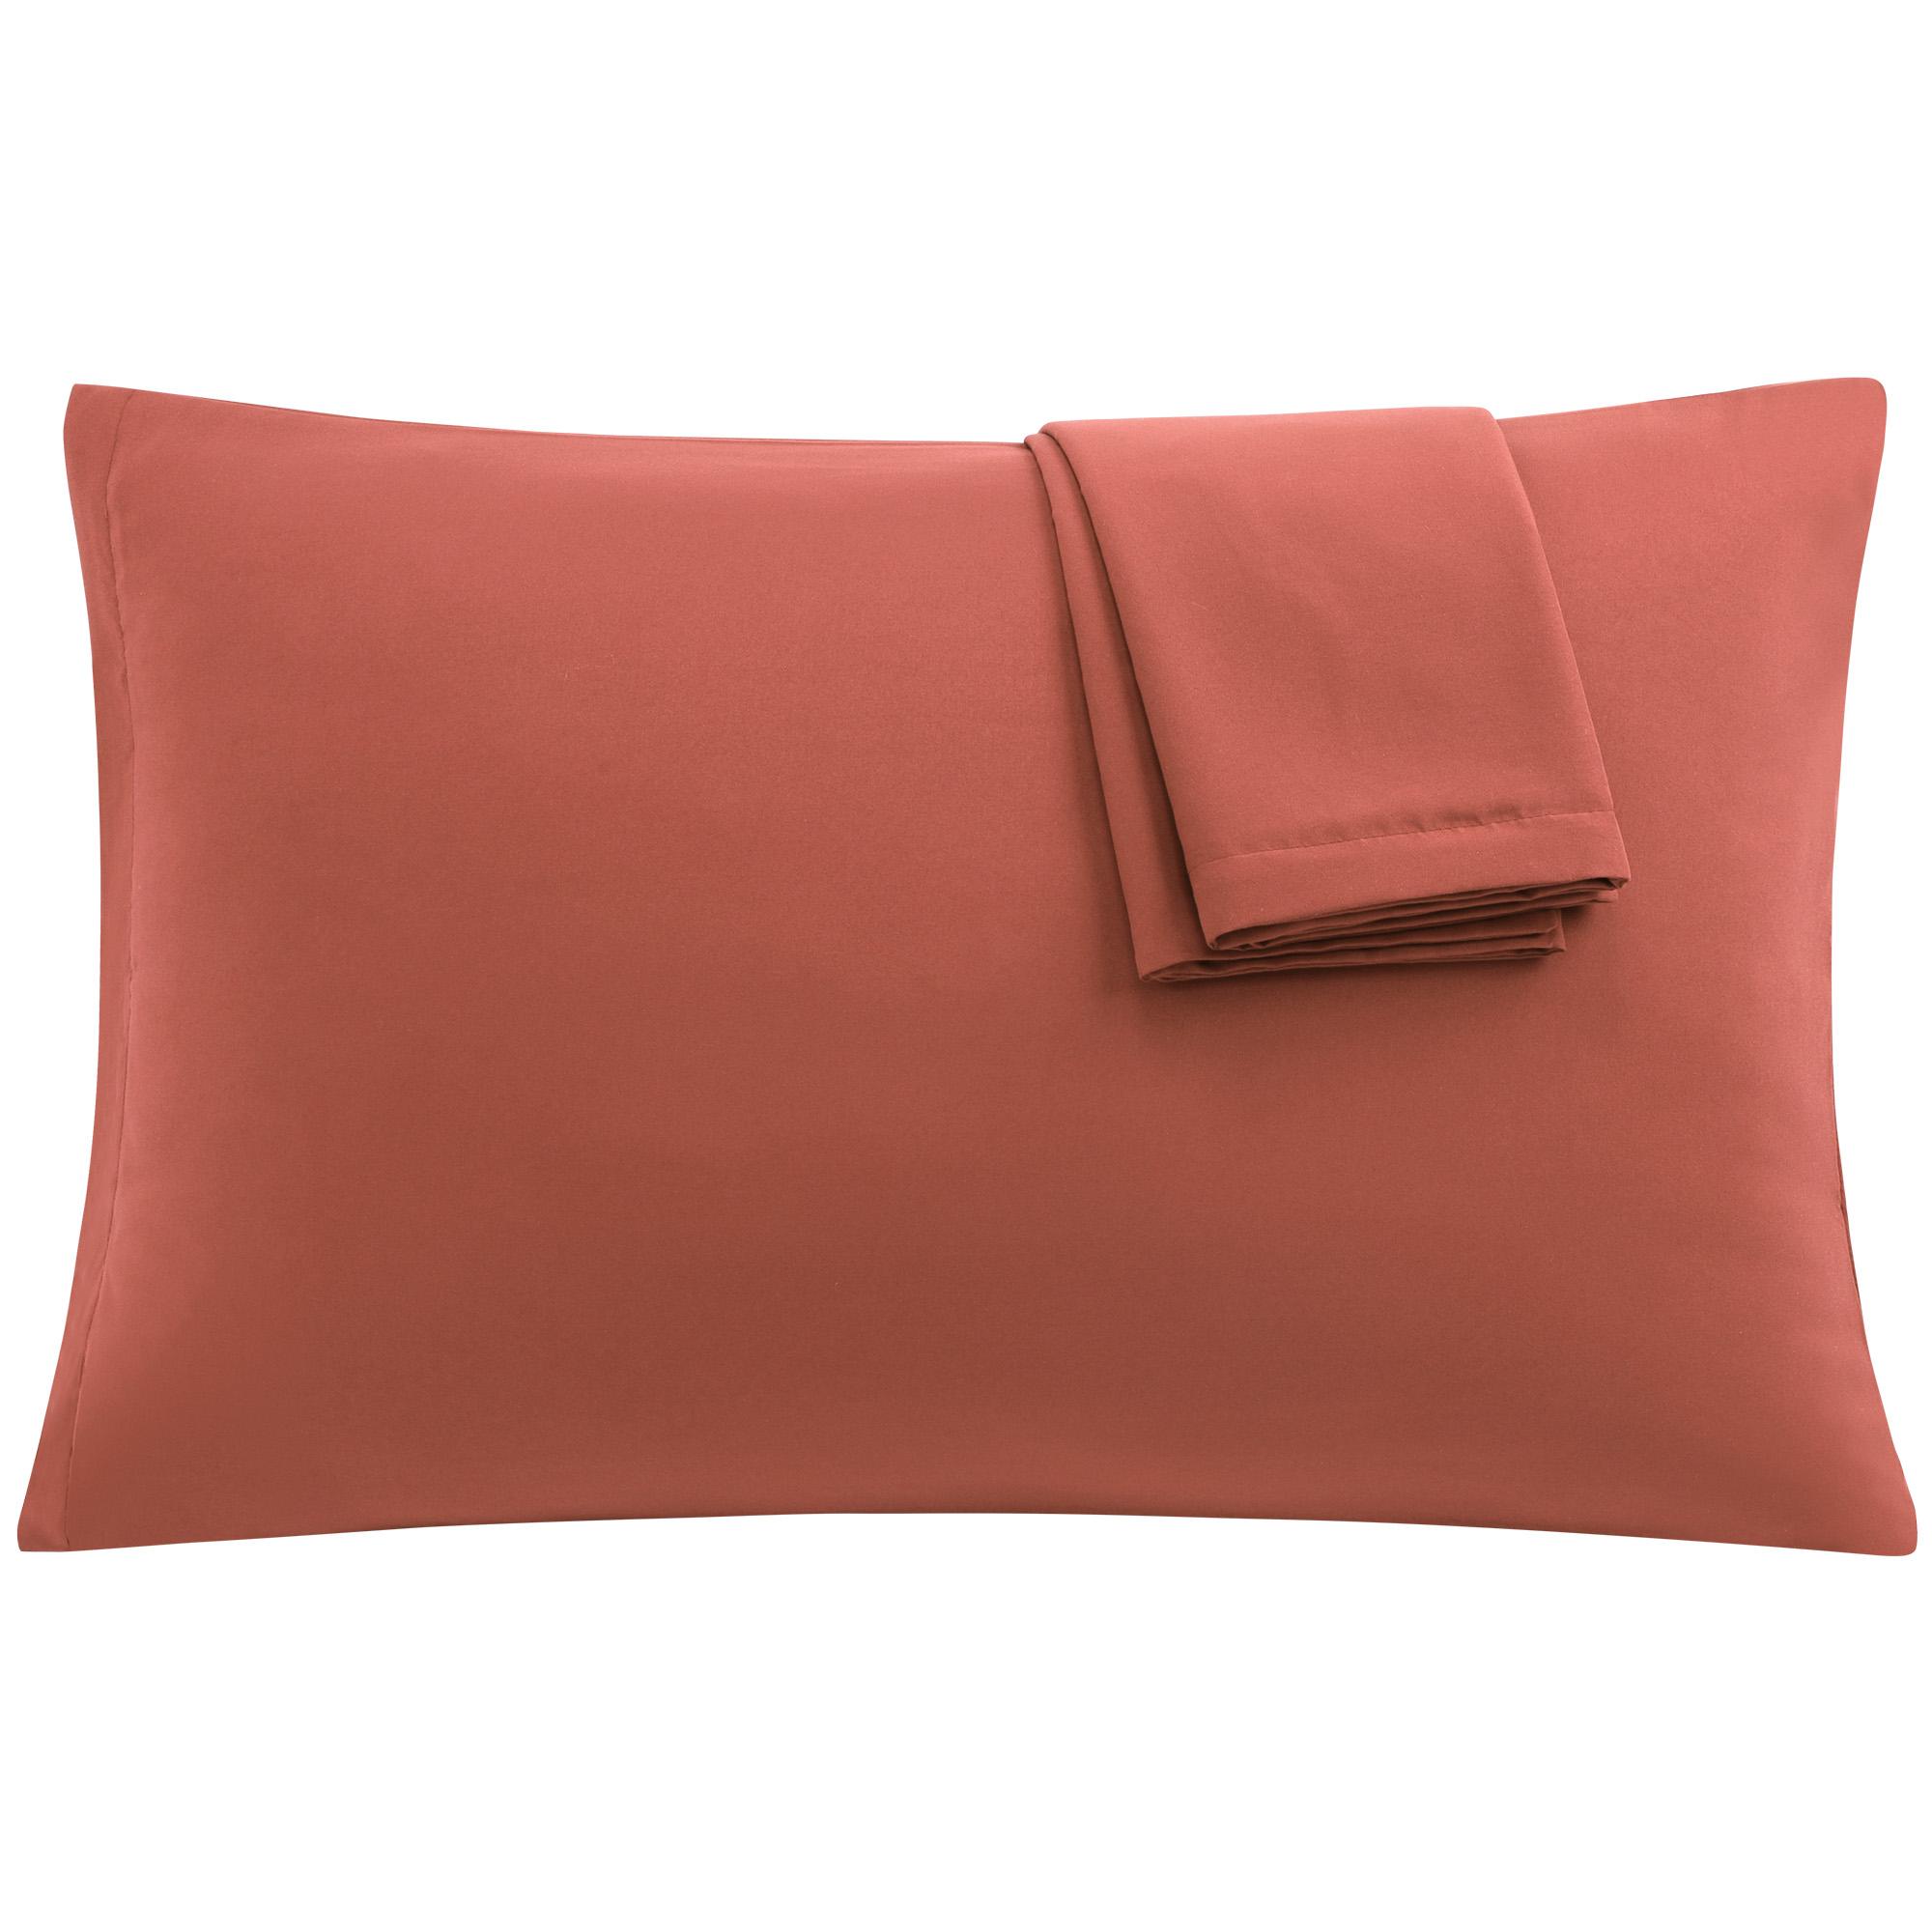 Orange Pillowcases Soft Microfiber Pillow Case with Zipper Travel, 2pcs